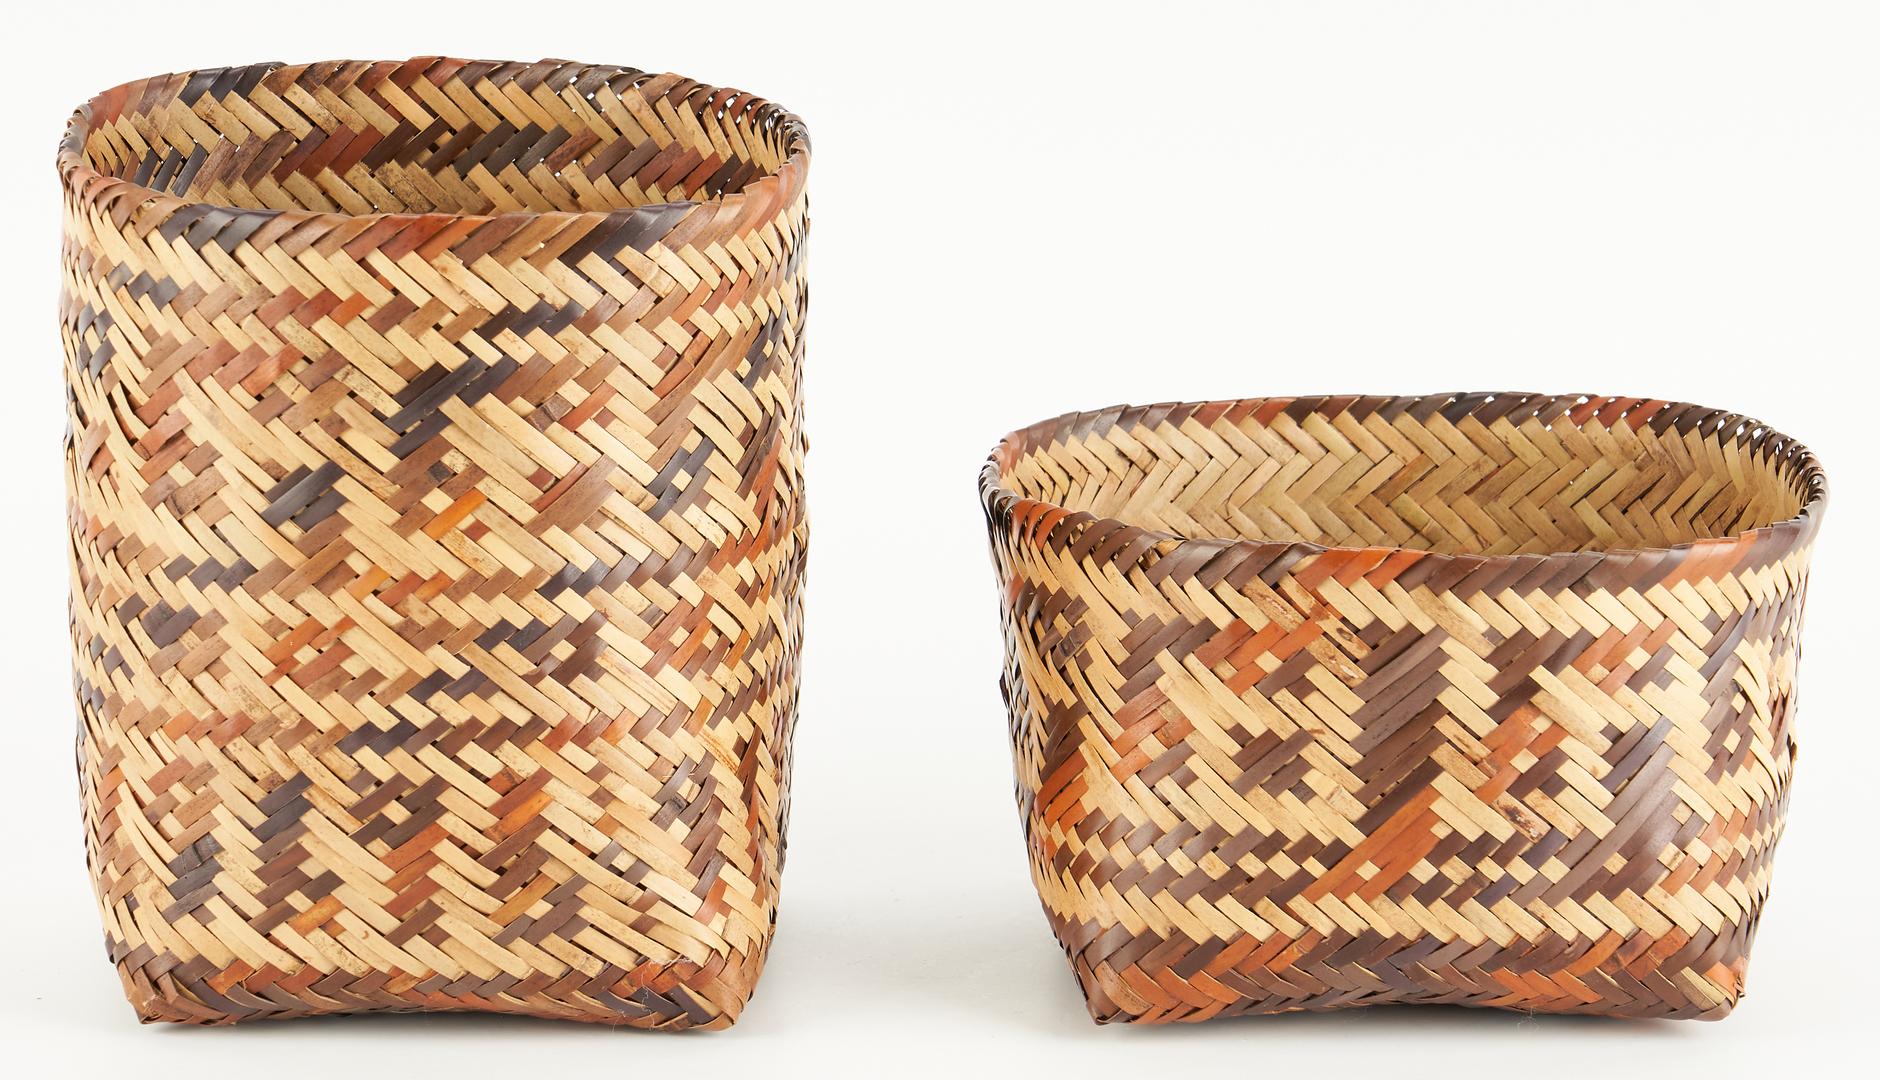 Lot 652: Lidded Choctaw Double Weave Rivercane Basket